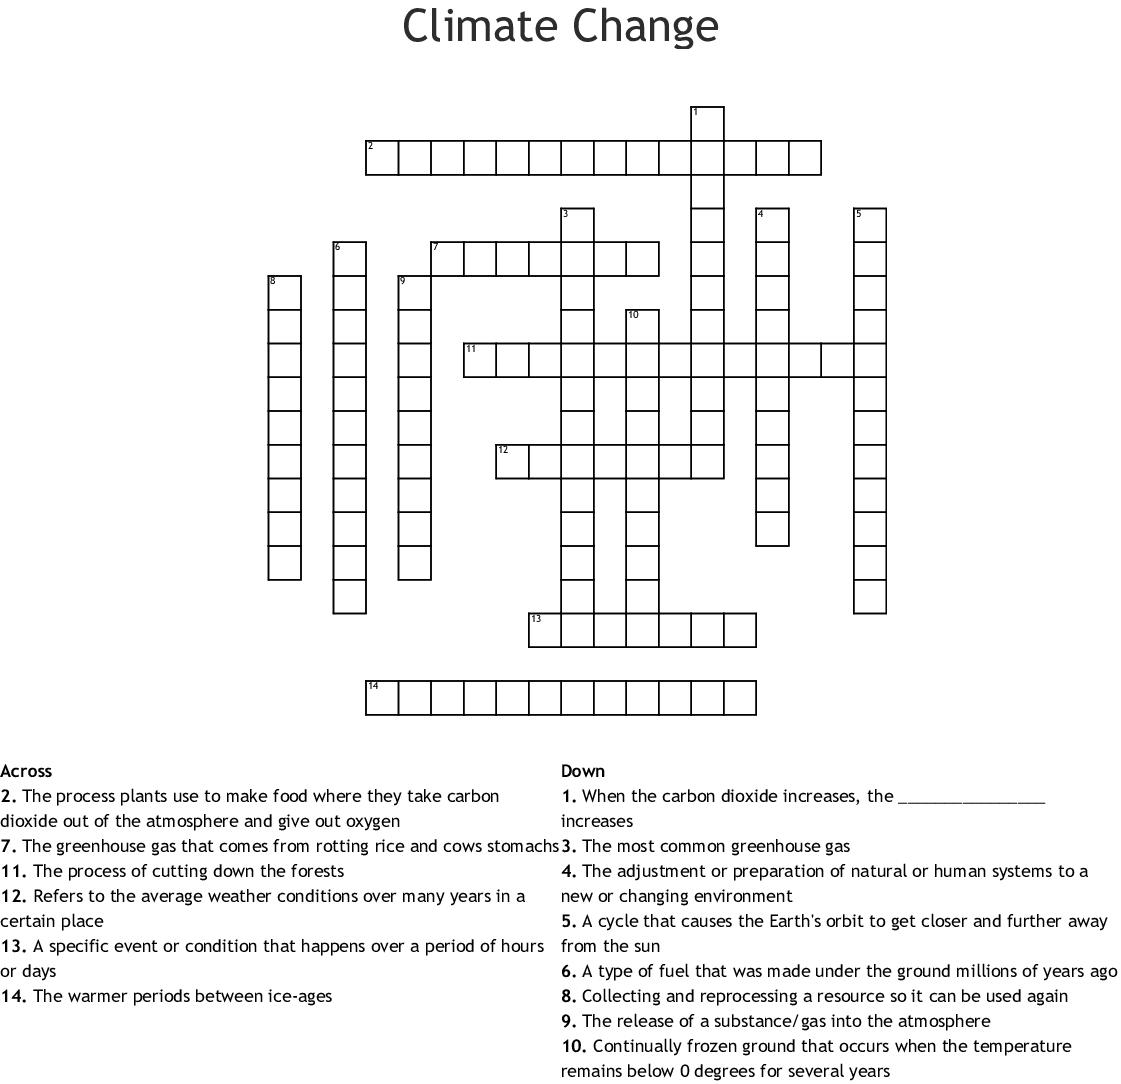 Climate Change Crossword - Wordmint - Global Warming Crossword Puzzle Printable